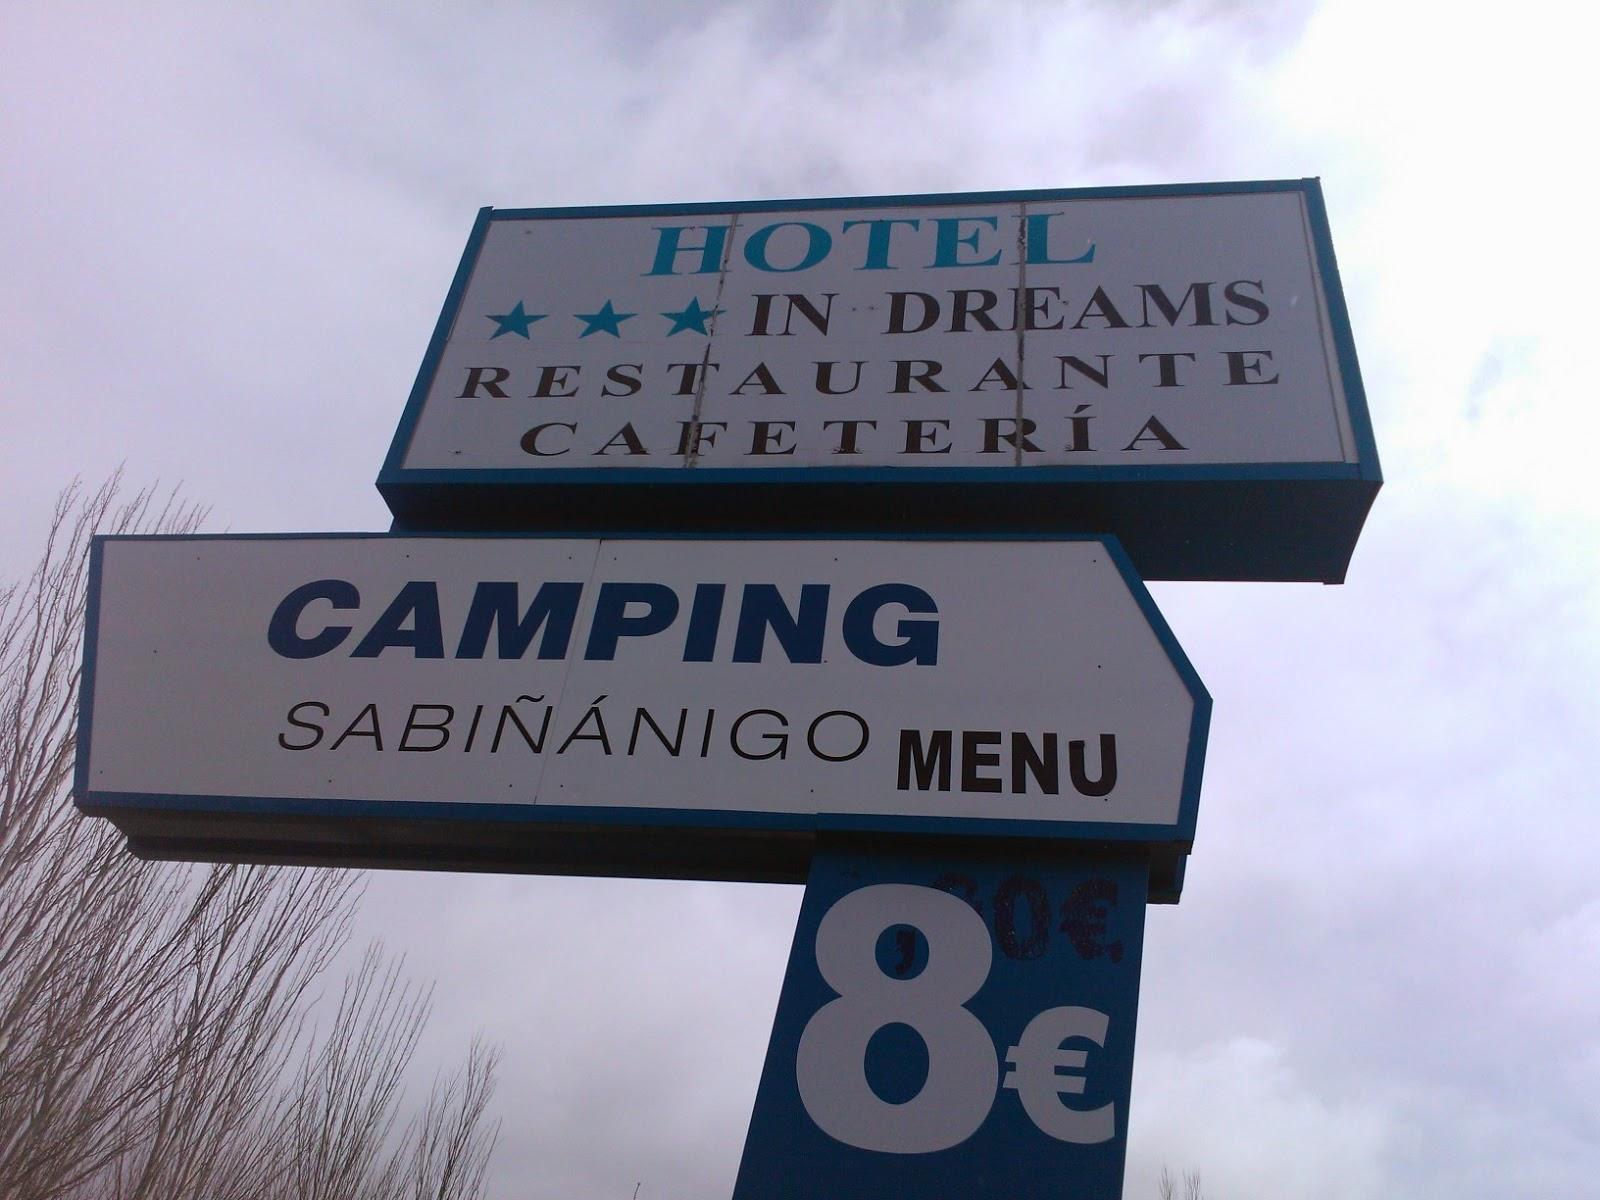 http://www.hotelindreams.com